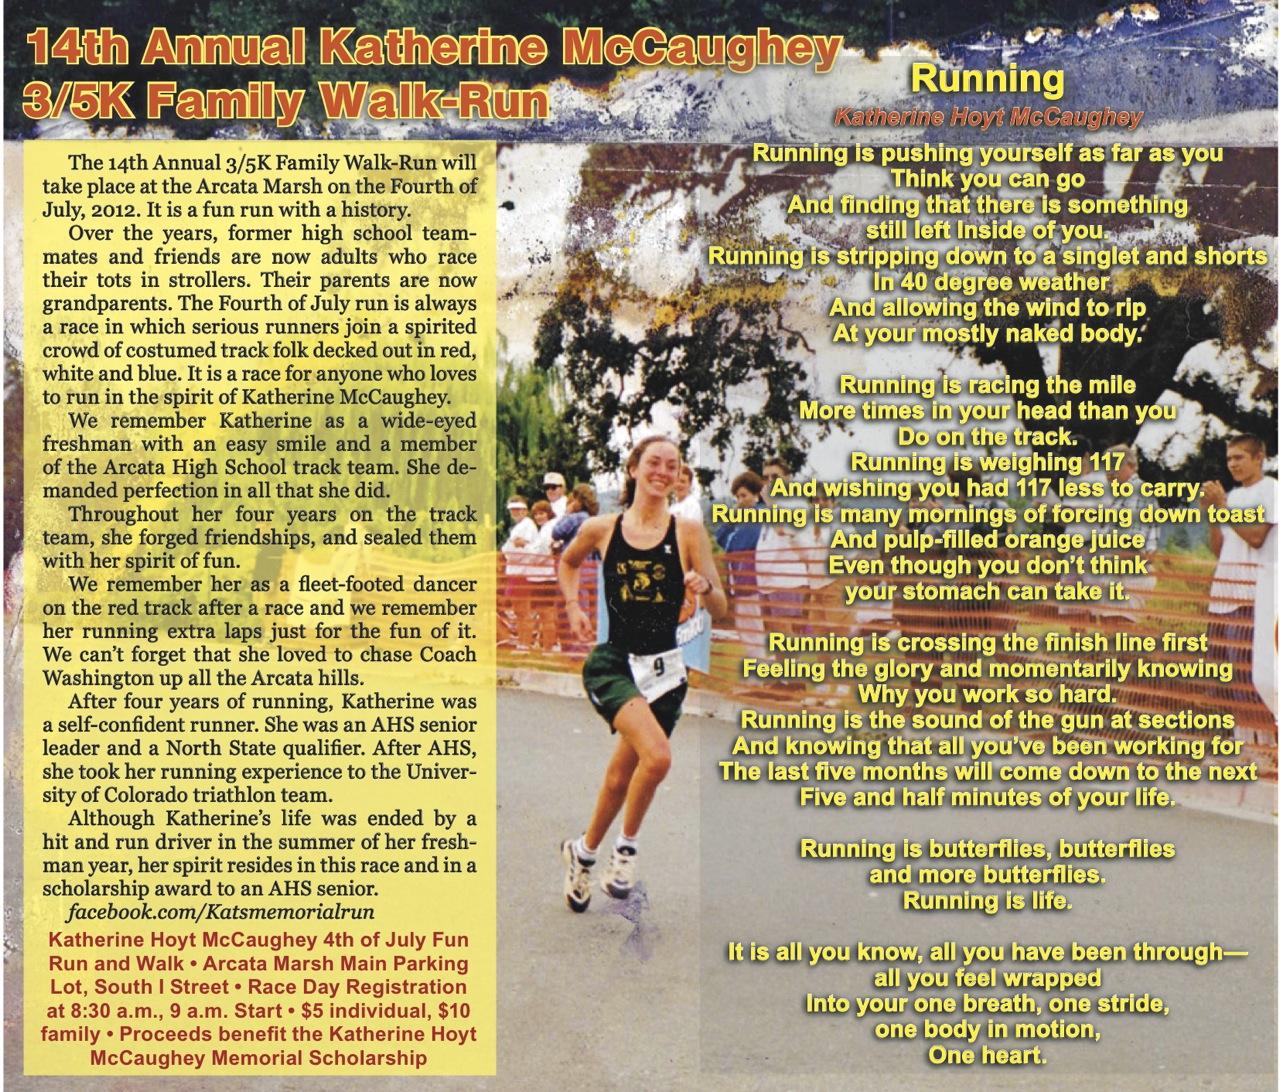 katherine-mccaughey-race